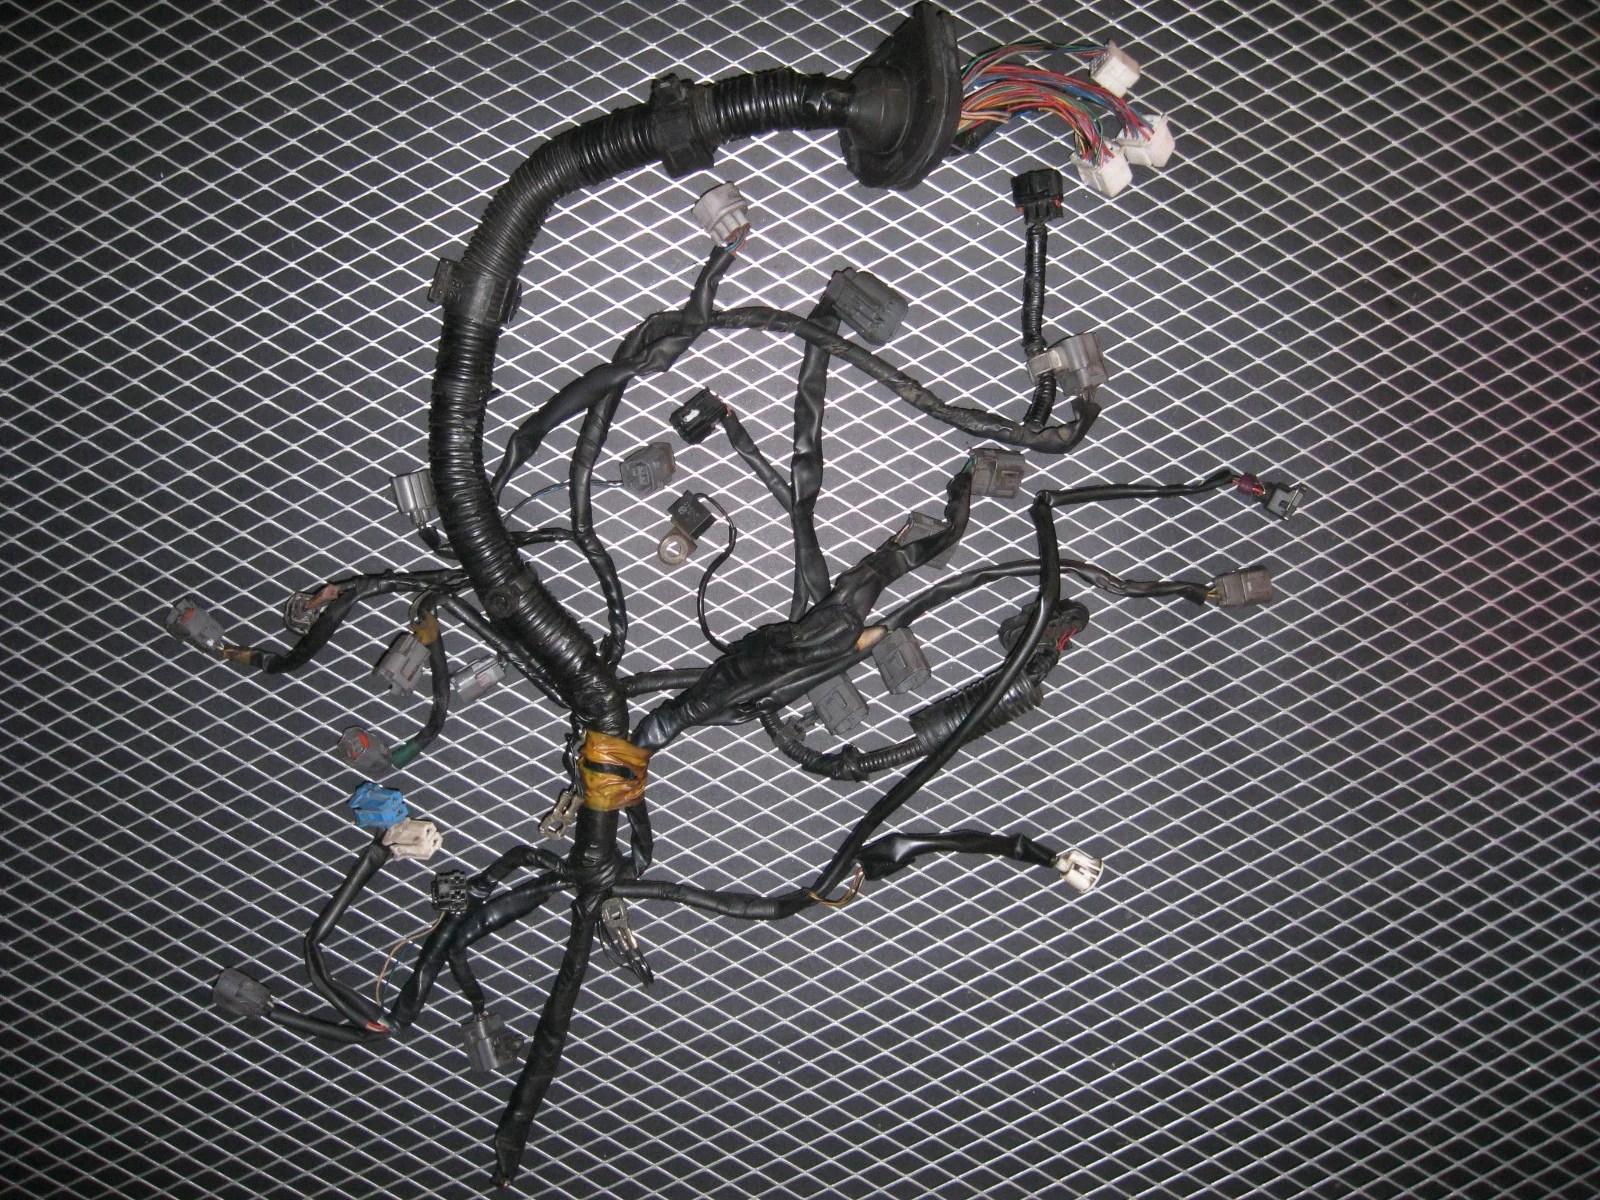 rx8 wiring harness circuits symbols diagrams u2022 1999 gmc yukon denali wiring diagram [ 1600 x 1200 Pixel ]